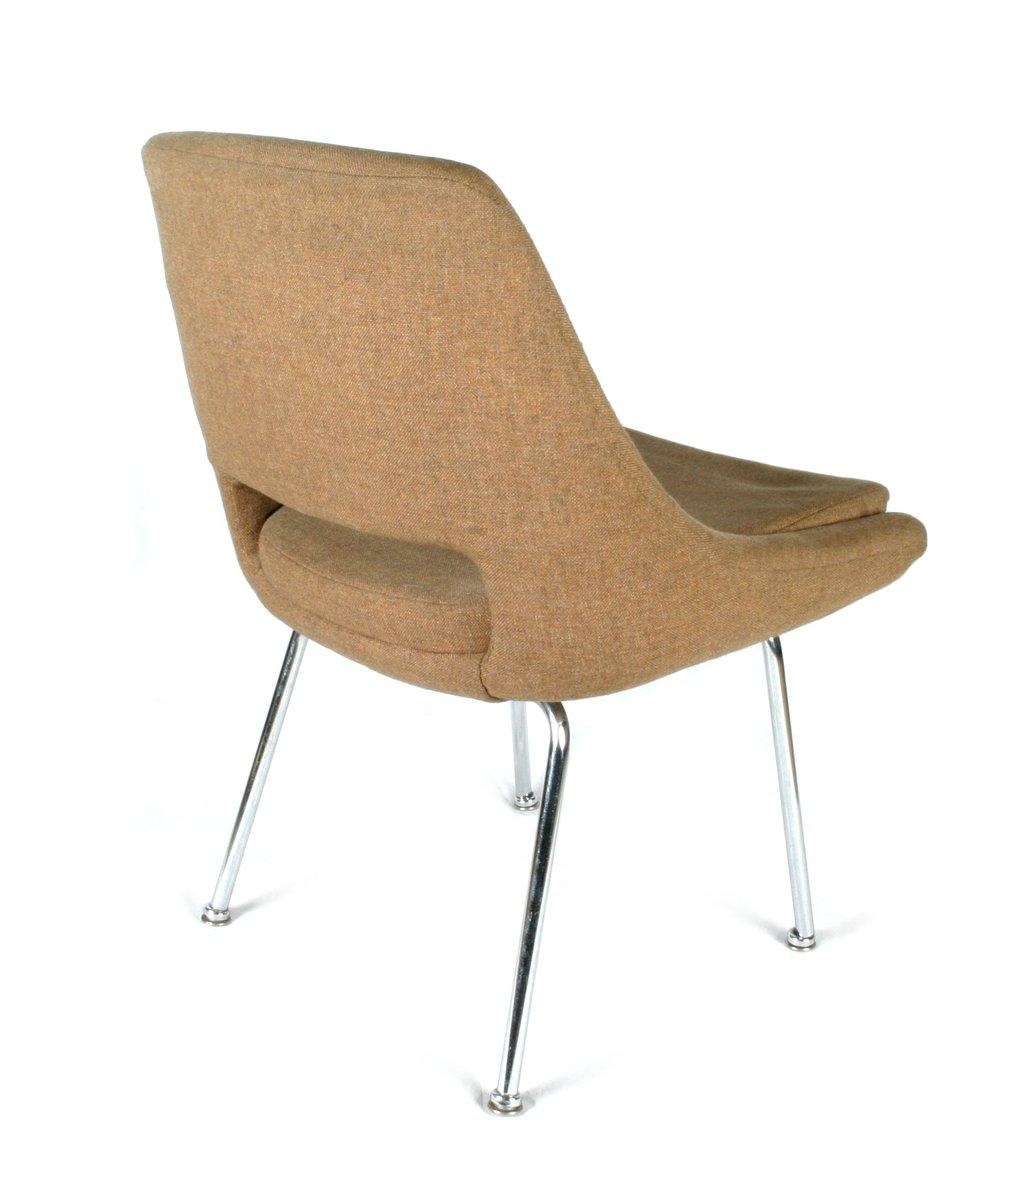 vintage sessel von fr scher kg 2er set bei pamono kaufen. Black Bedroom Furniture Sets. Home Design Ideas